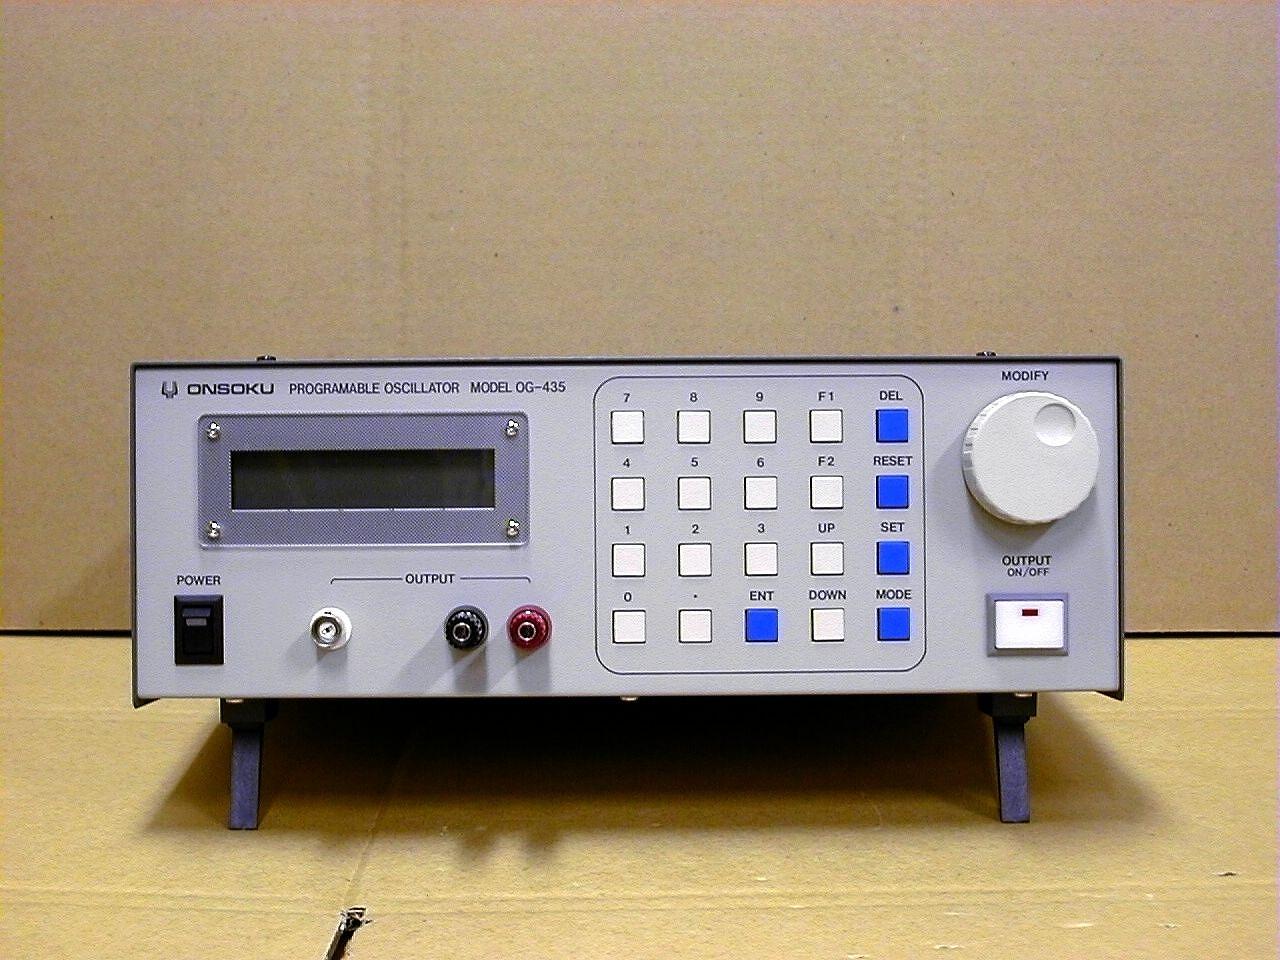 Og 435 Programmable Oscillator Onsoku Web Site English Audio Oscillators Product Summary This Is Designed For